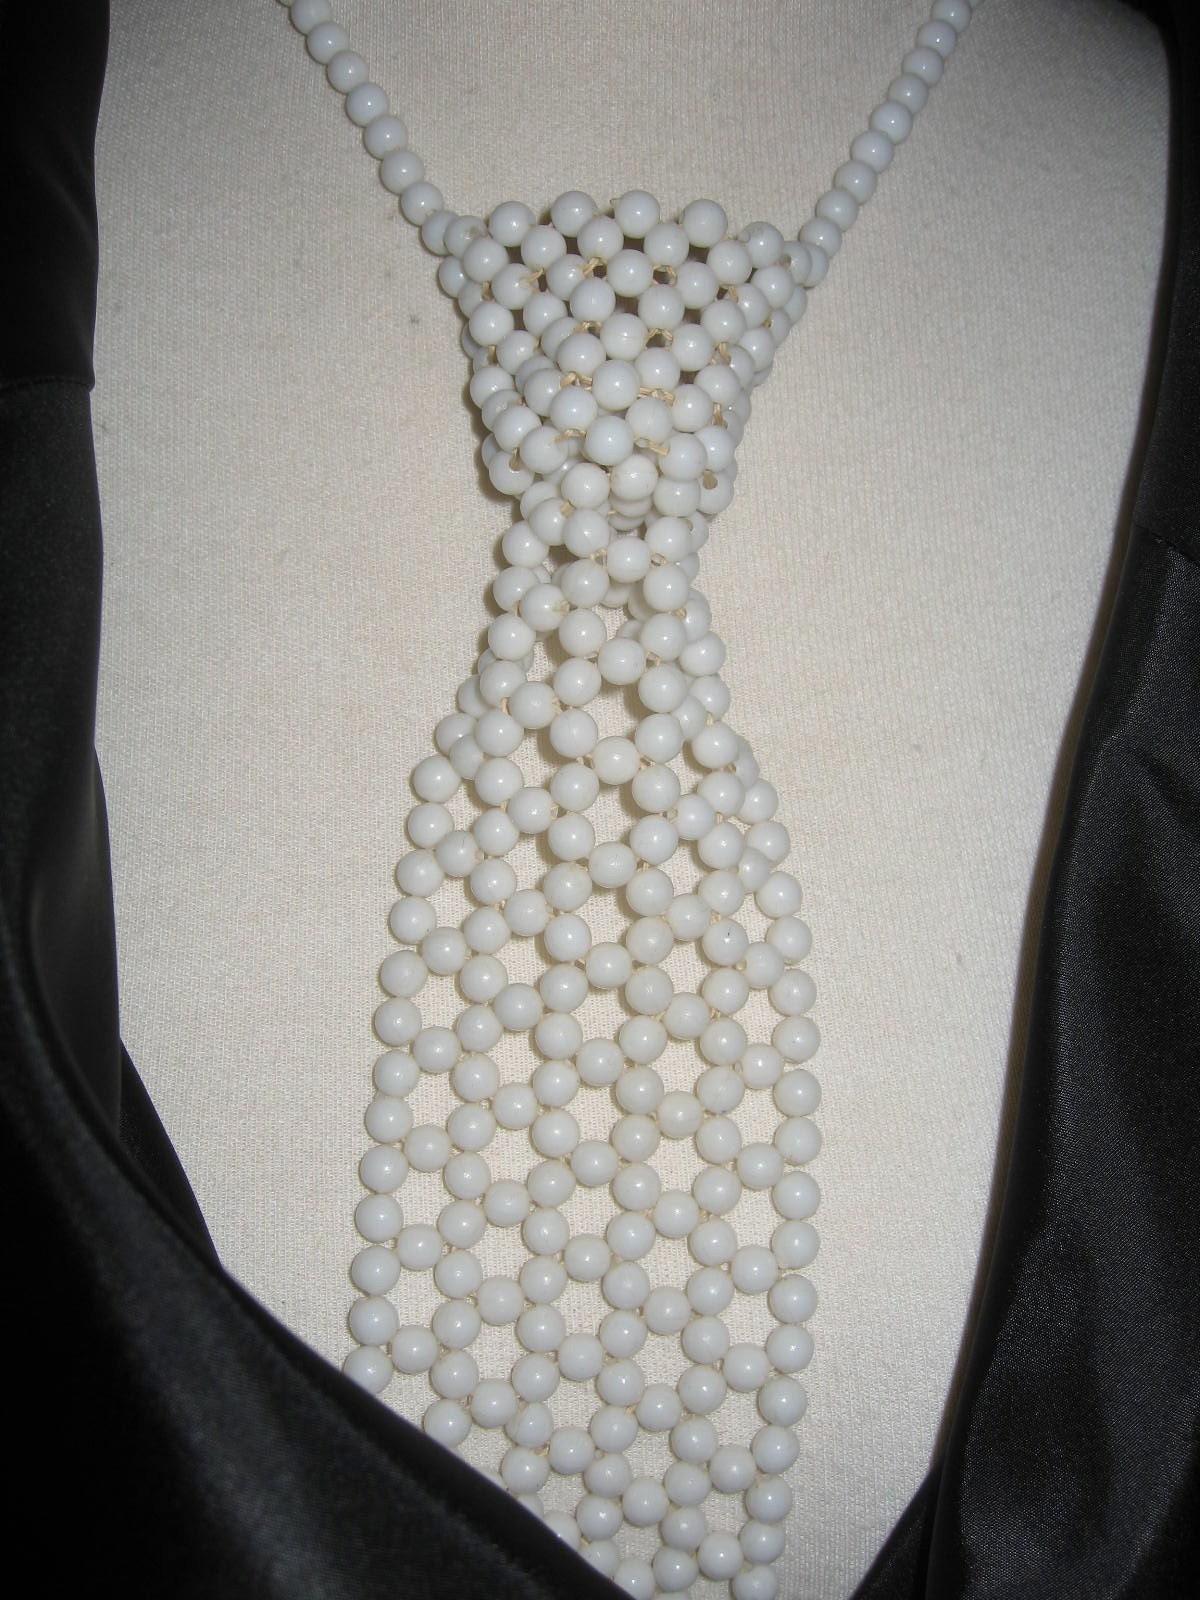 Beaded Tie Necklace Funky Fun Kitsch White Beads Tuxedo Tie